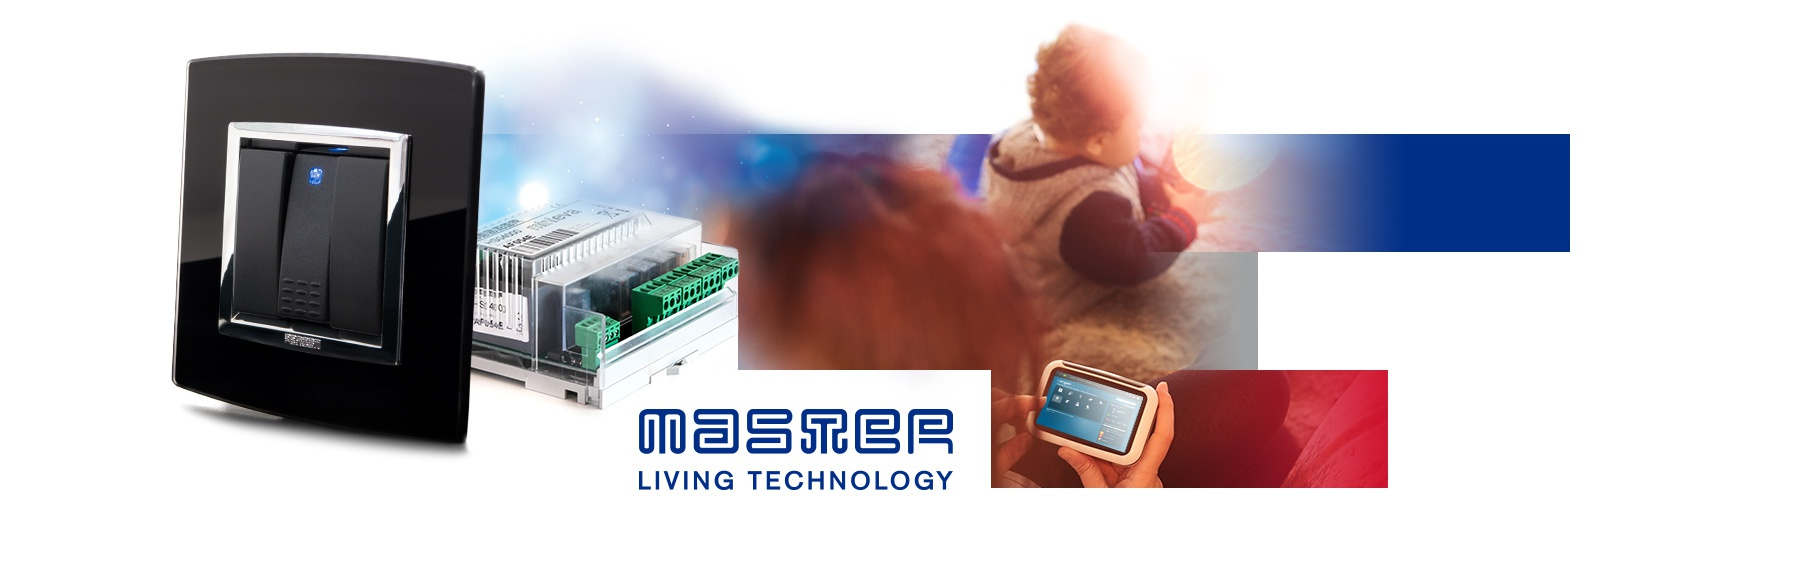 Master Divisione Elettrica